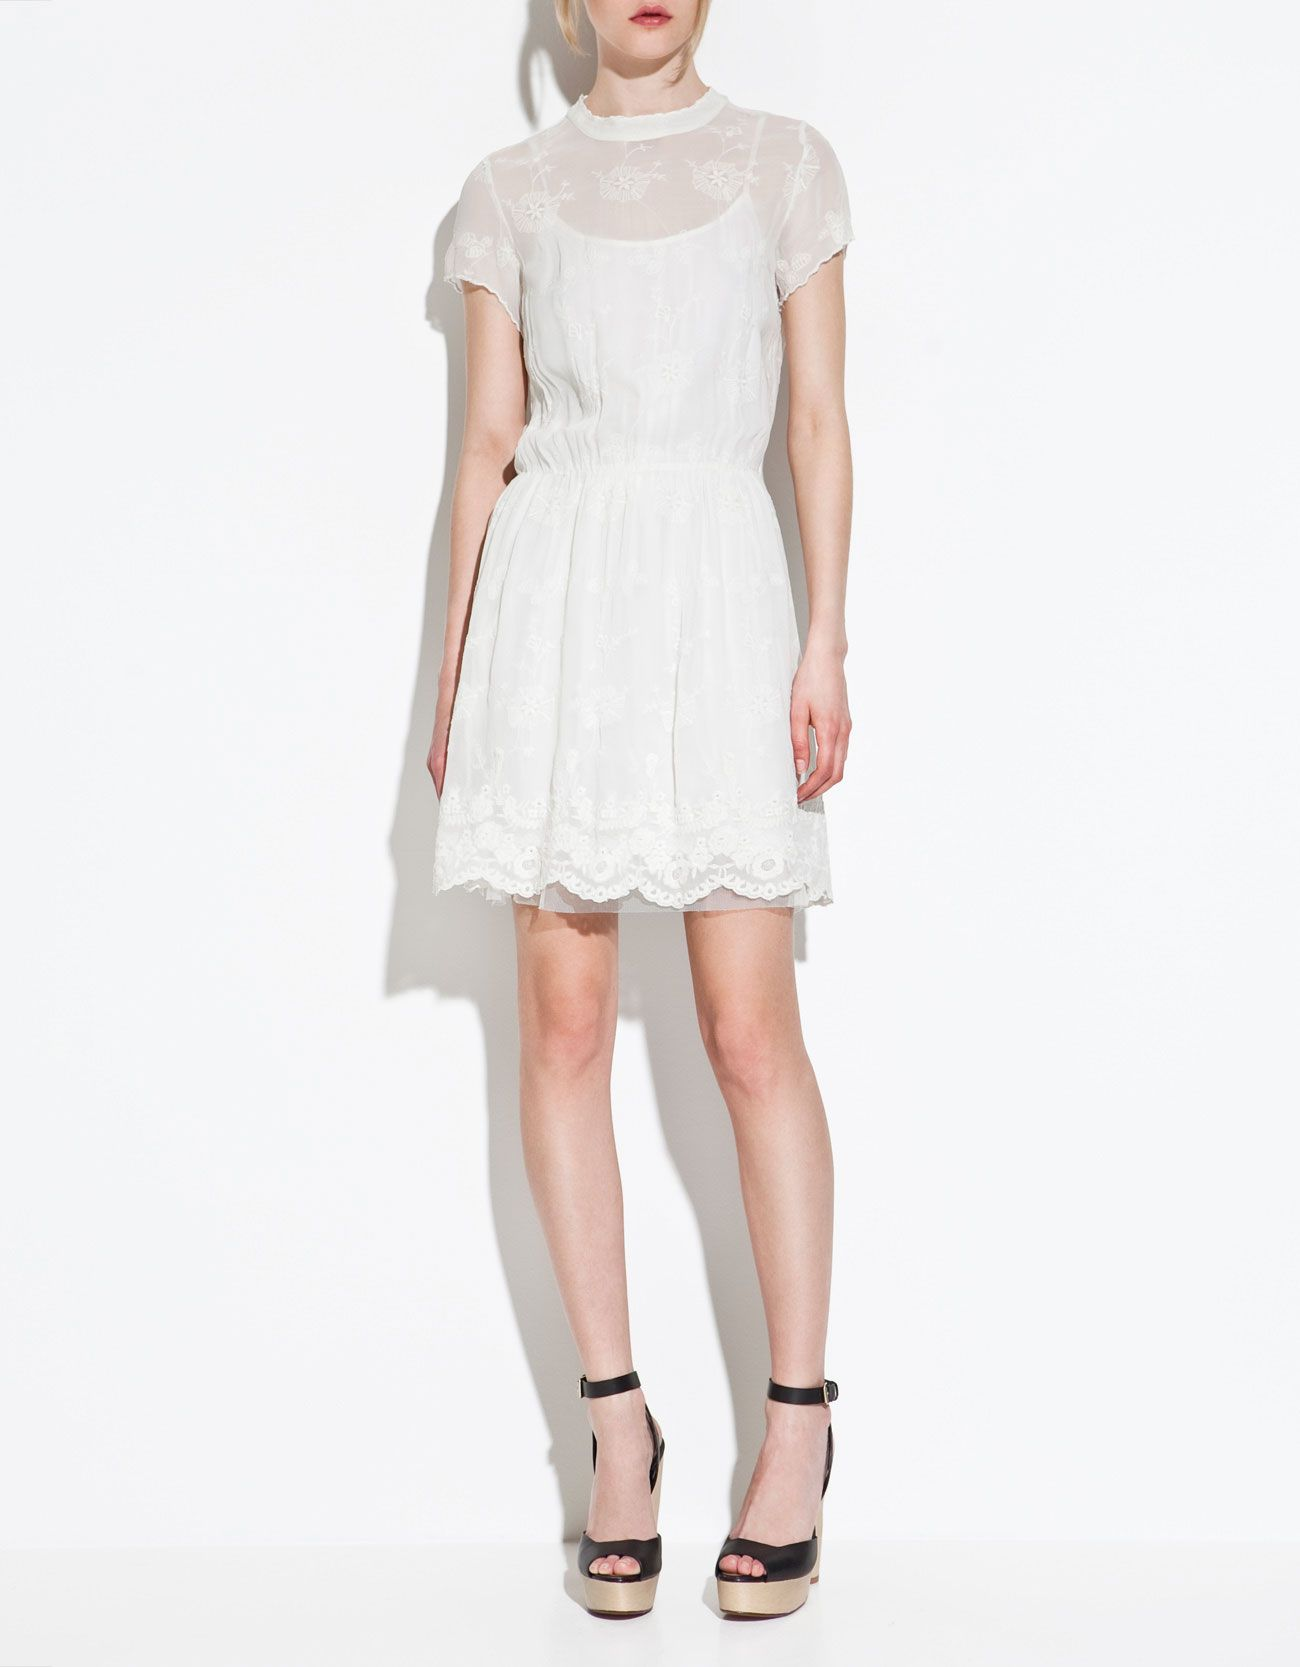 pretty lace dress from Zara  Weißes spitzenkleid, Kleider